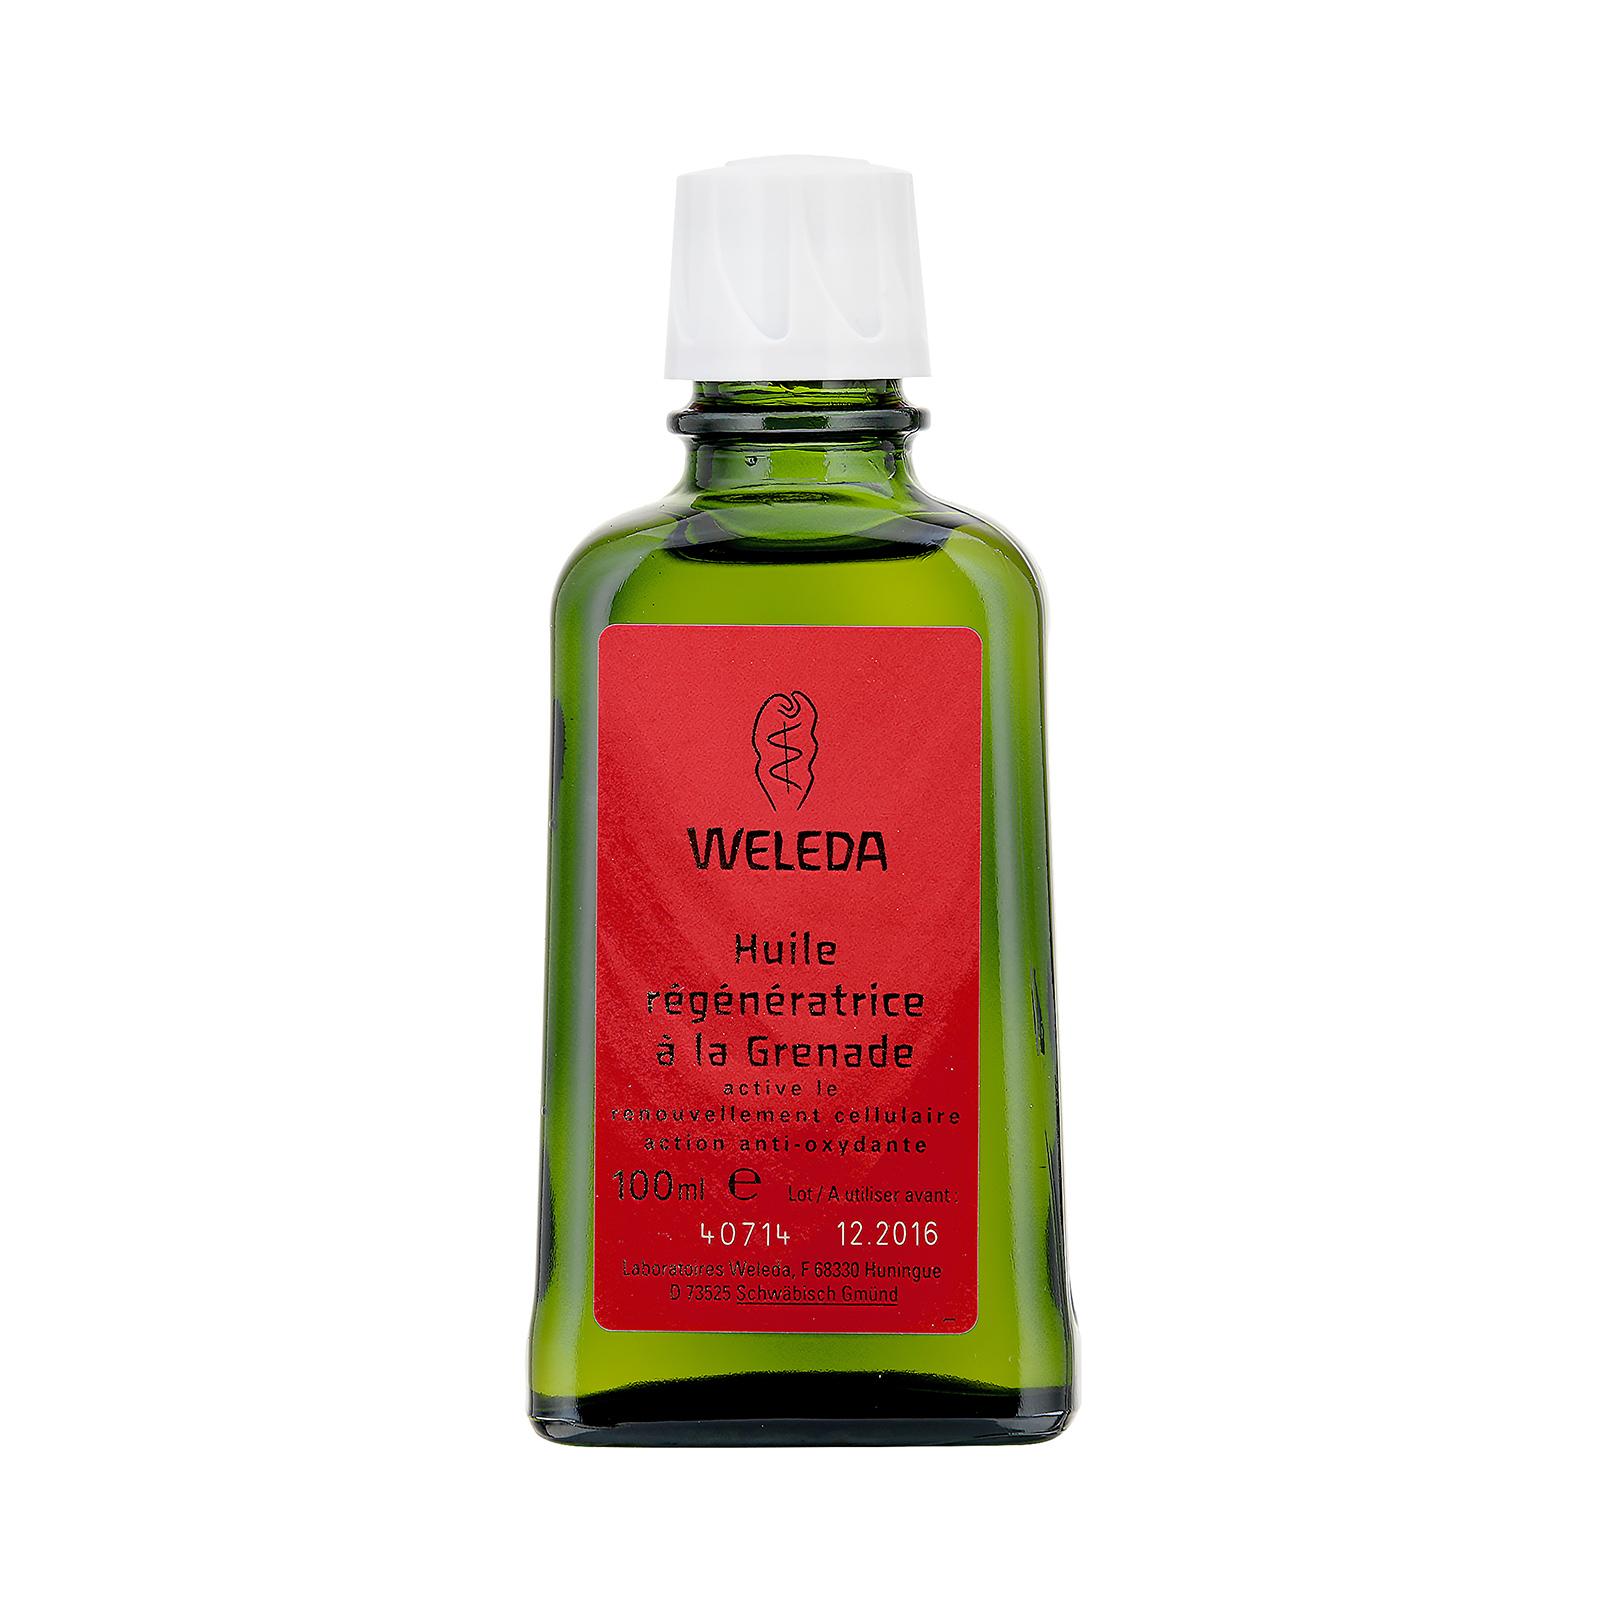 Weleda Pomegranate  Pomegranate Regenerating Body Oil 100ml, from Cosme-De.com